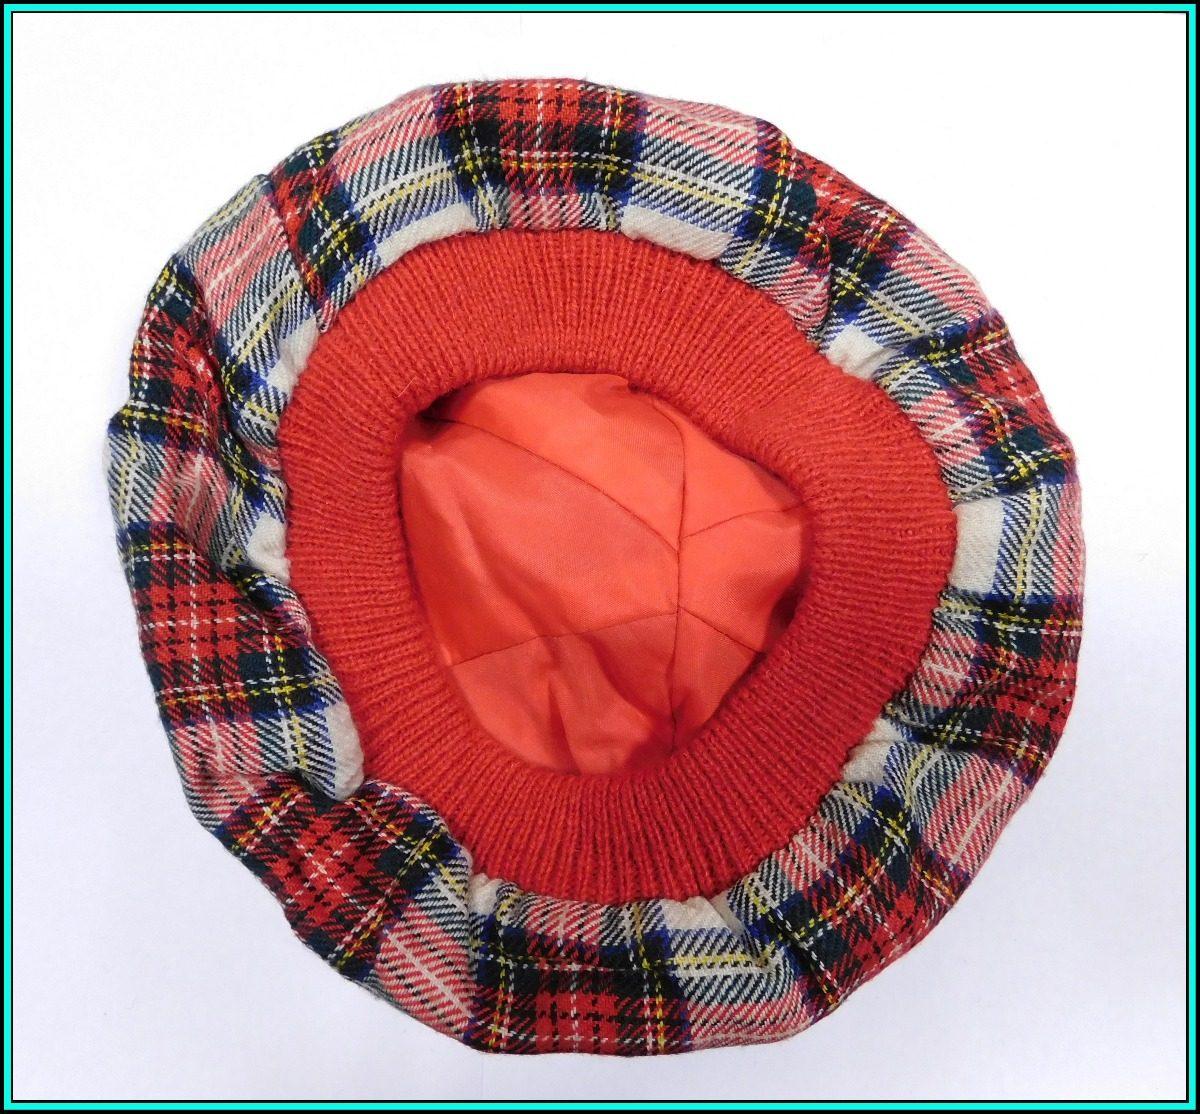 a5d8a54b6103b original boina escocesa 100% pura lana - made in scotland m2. Cargando zoom.